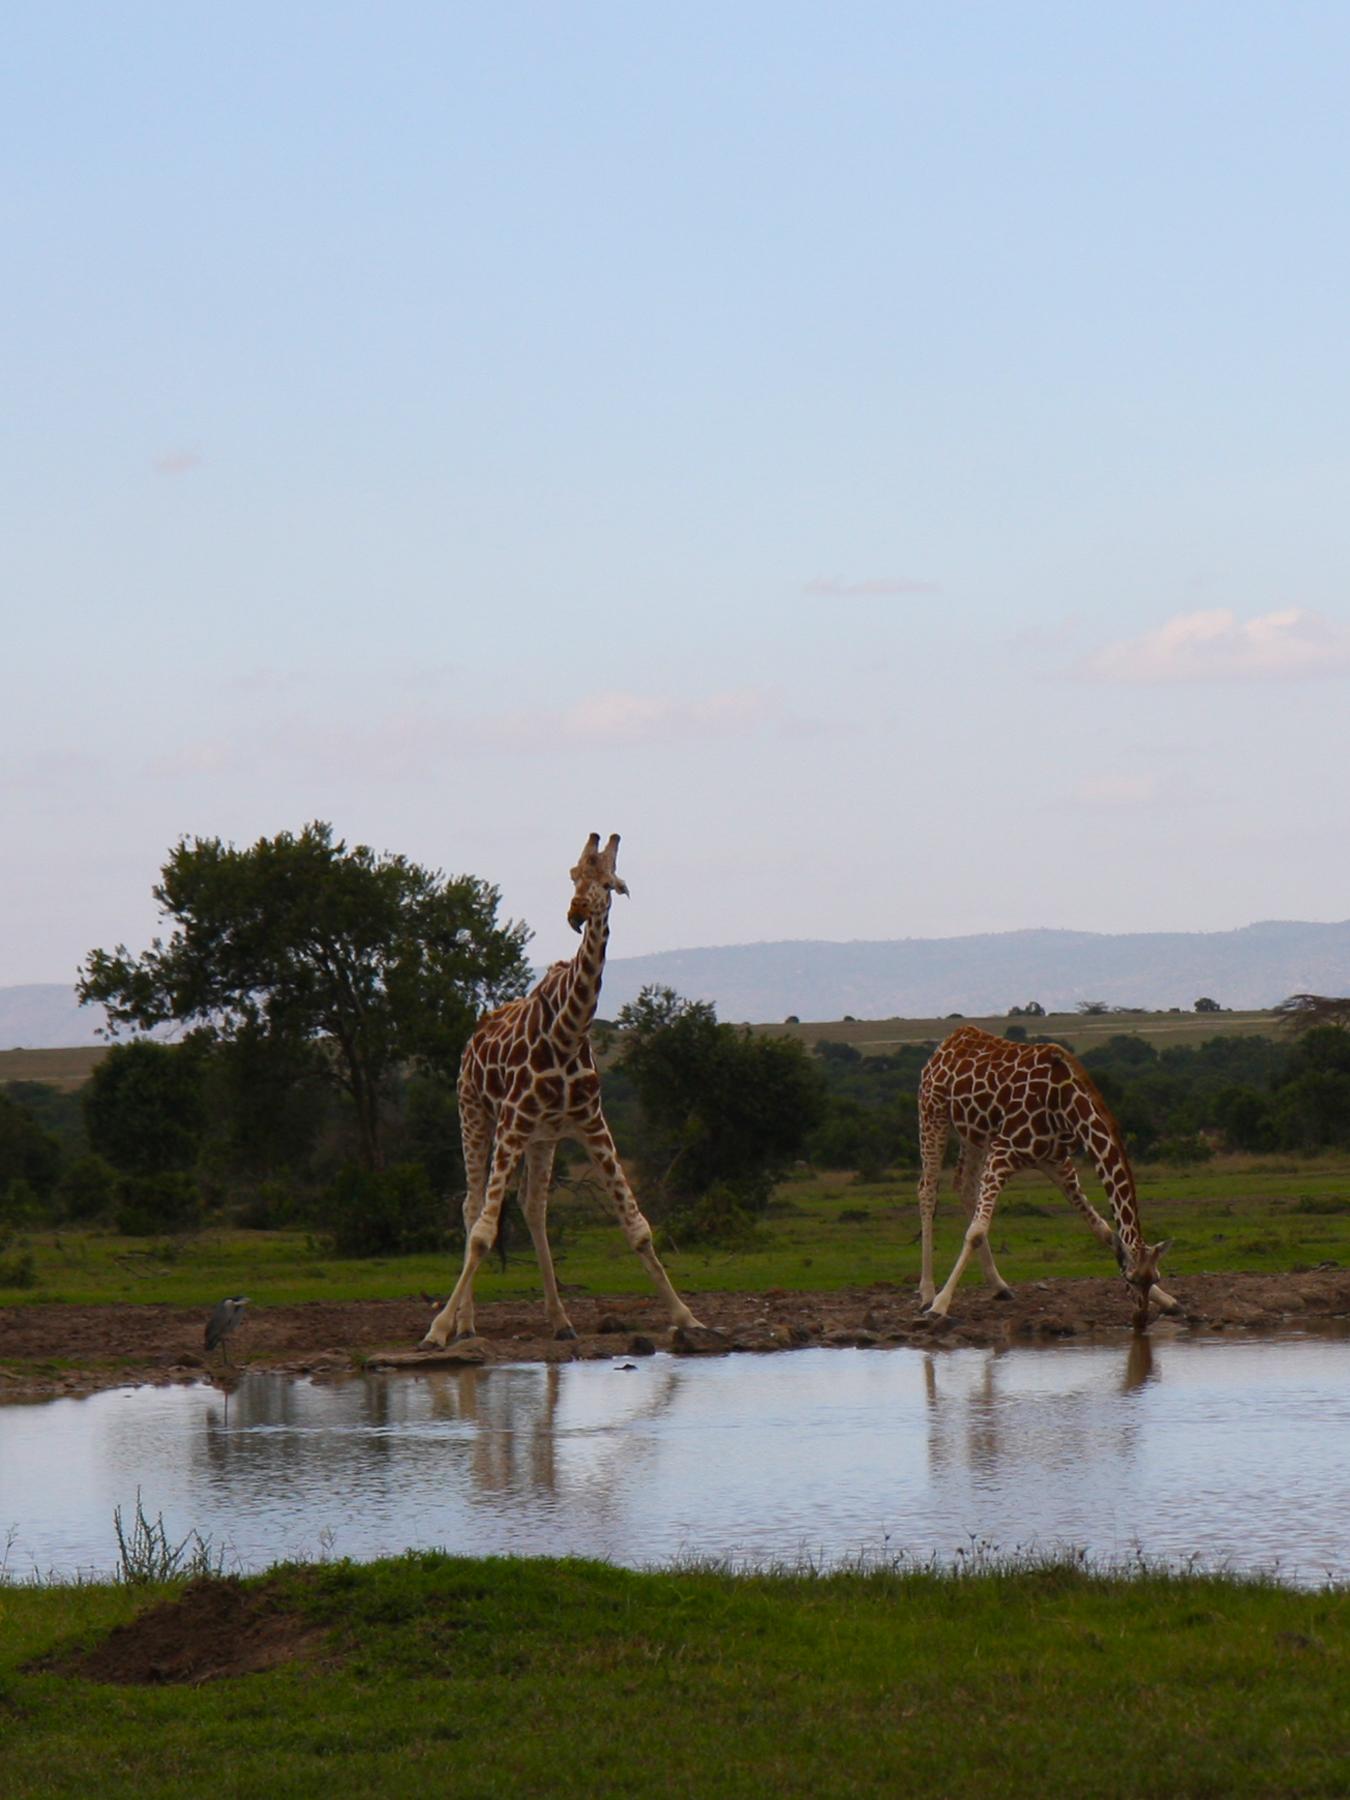 Sweetwater_giraffedrink.jpg